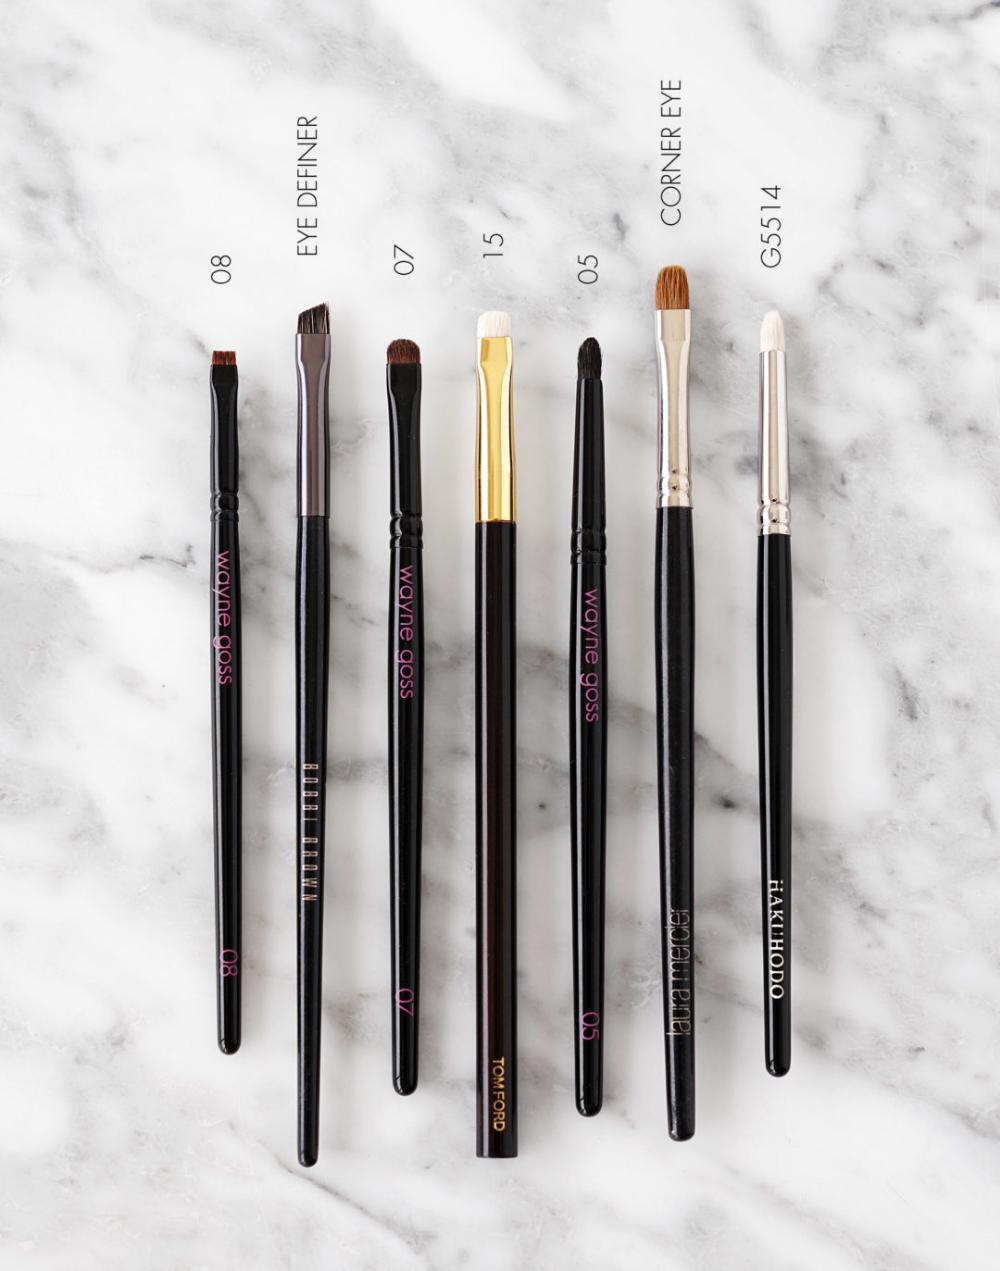 Wayne Goss Archives The Beauty Look Book Makeup tools